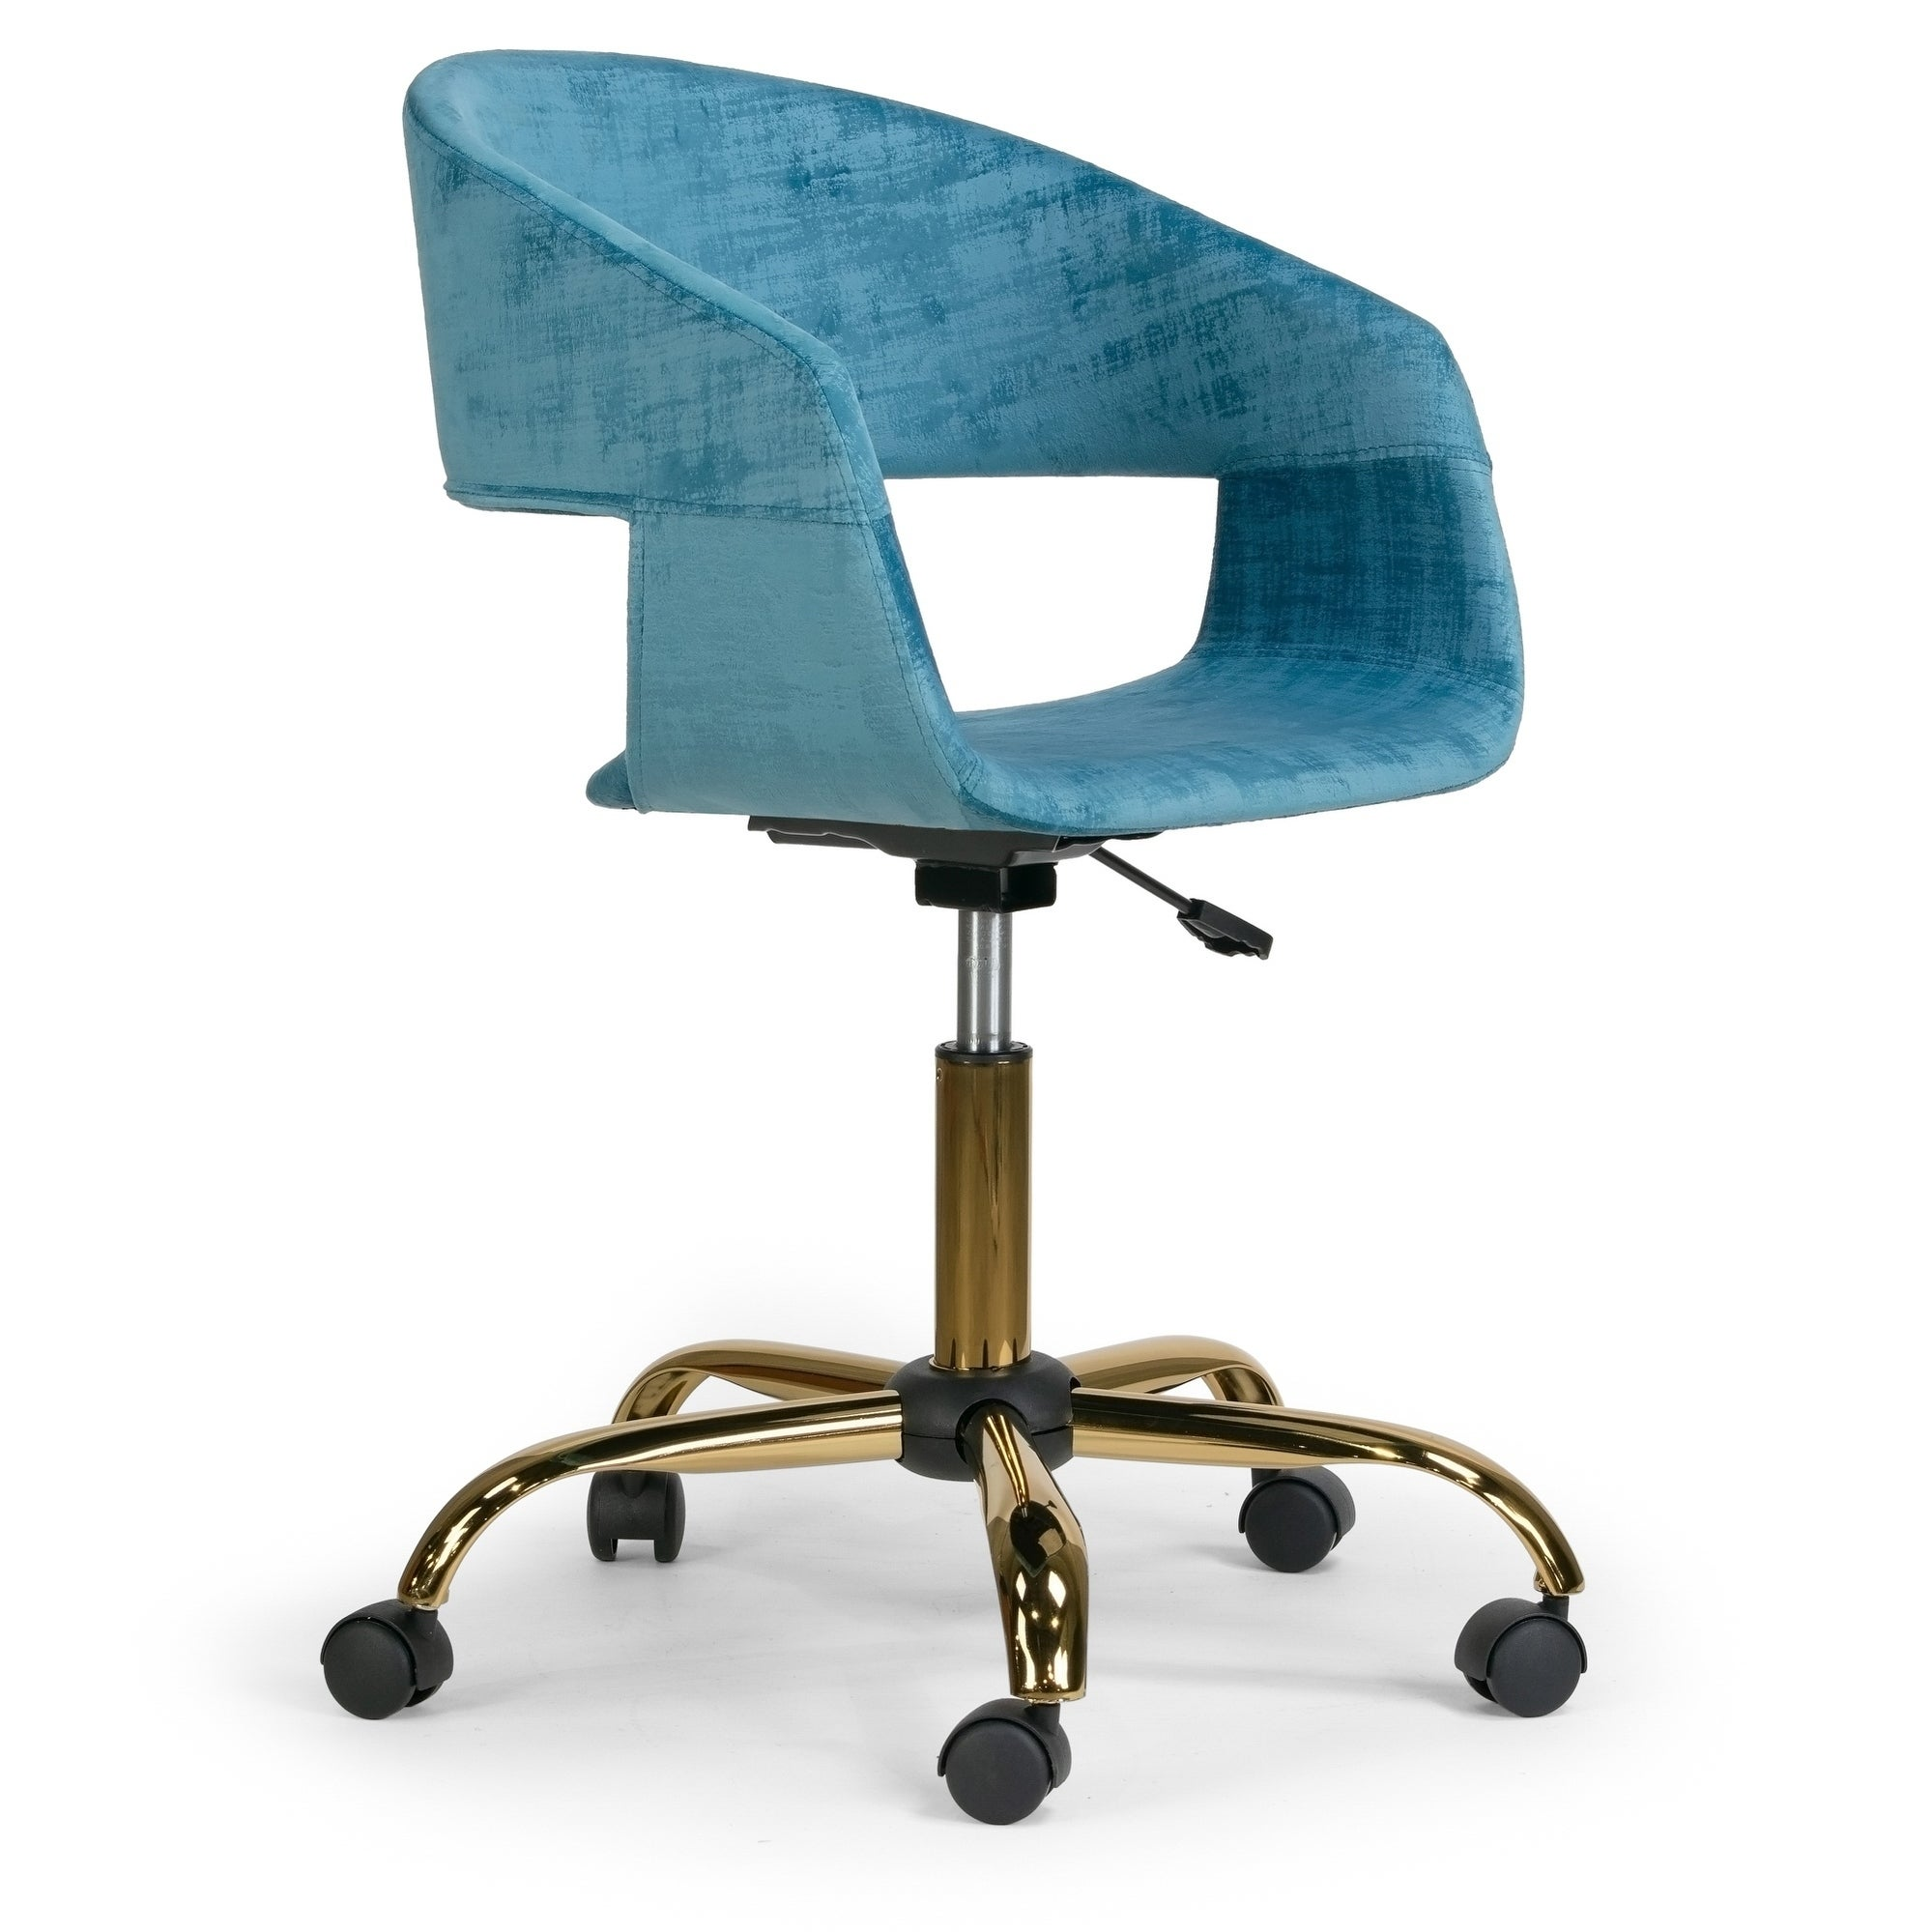 Image of: Shop Black Friday Deals On Amani Blue Velvet Office Chair Overstock 23136475